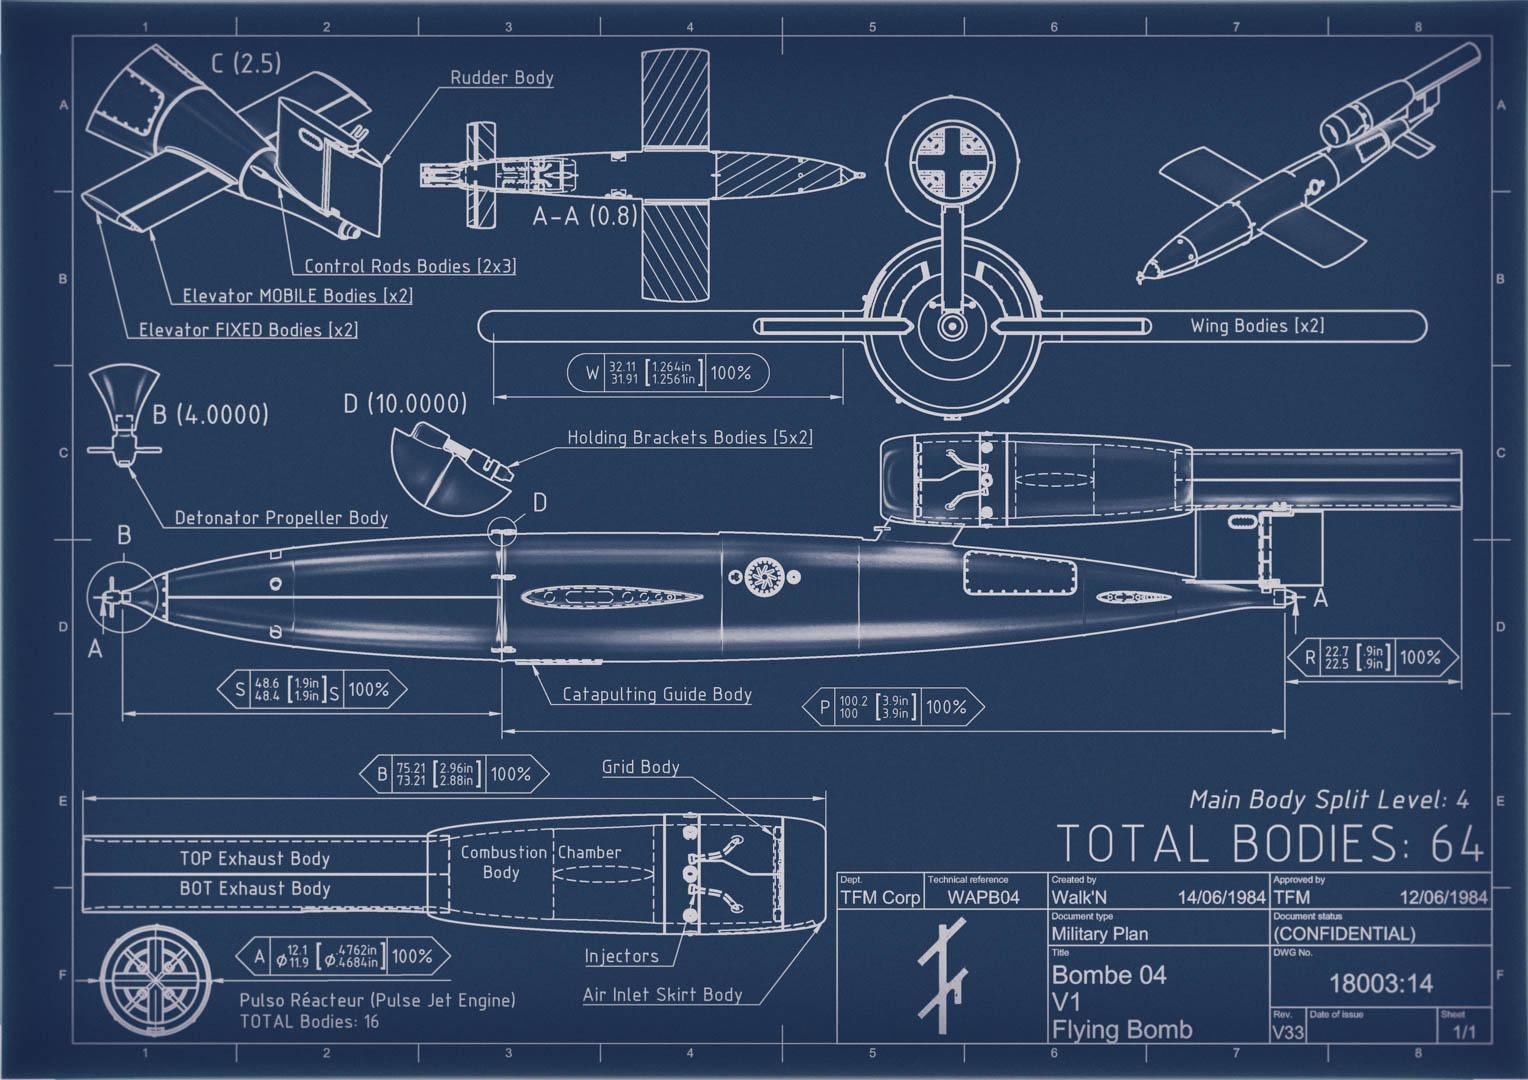 Missle Asset Kit - Bomb 05.jpg